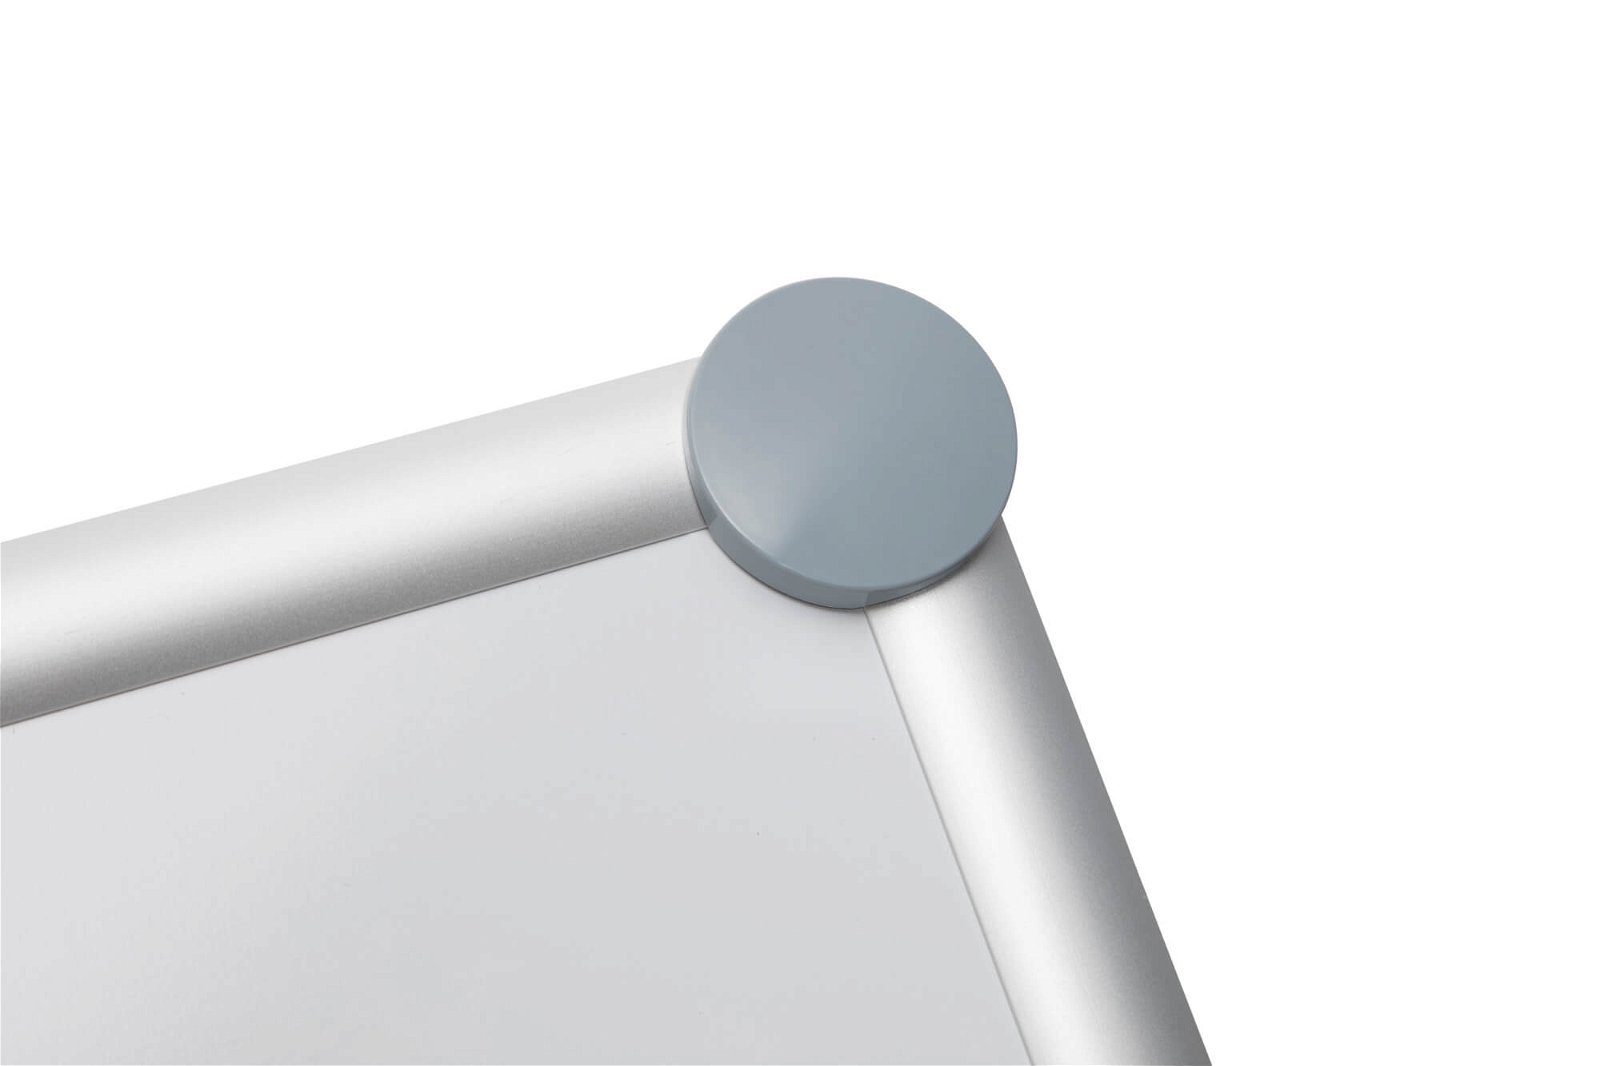 Whiteboard 2000 MAULpro, 90x120 cm, grau